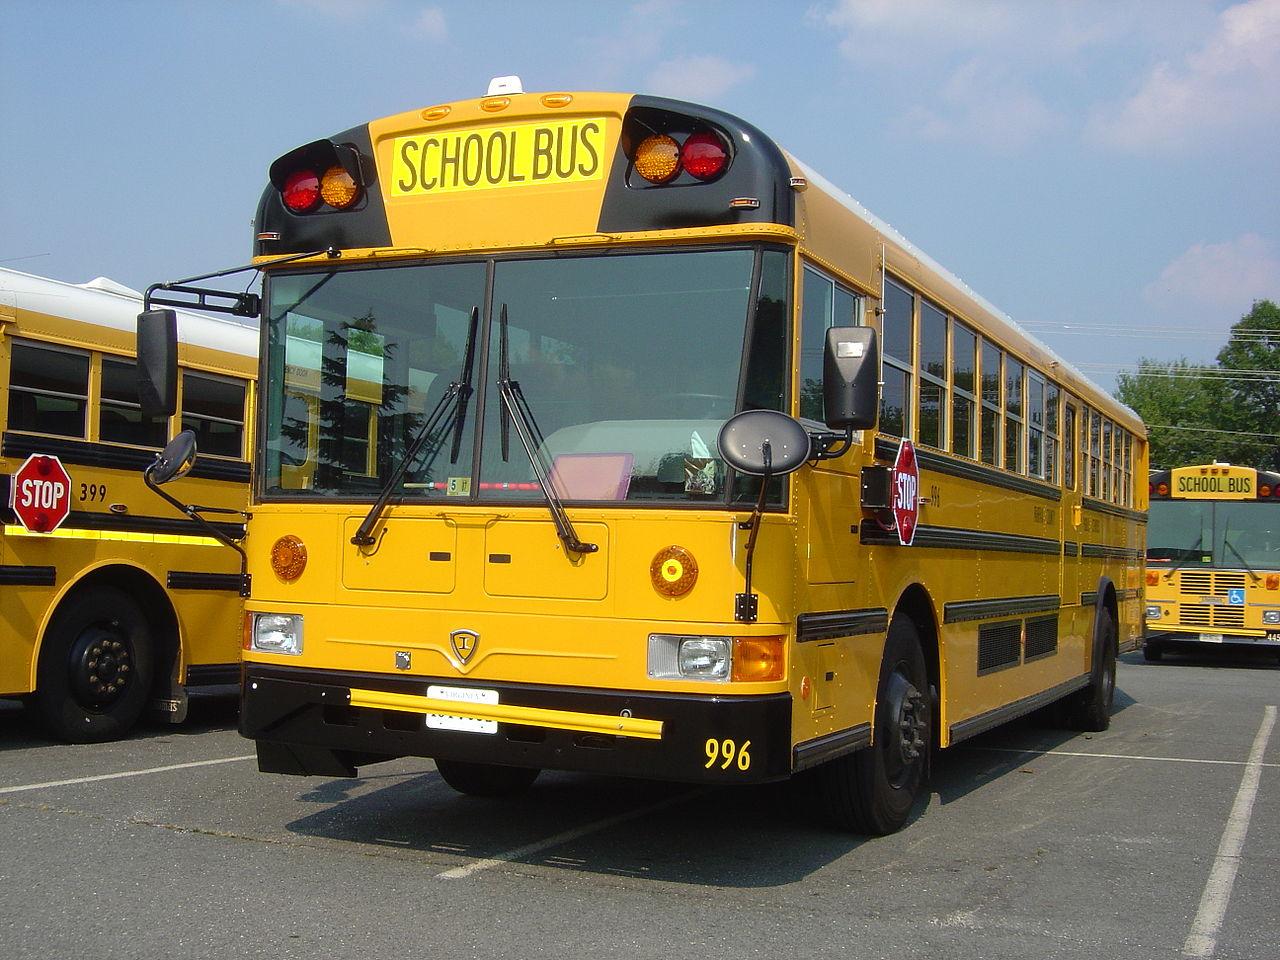 Loudoun County Vehicle Property Tax Records